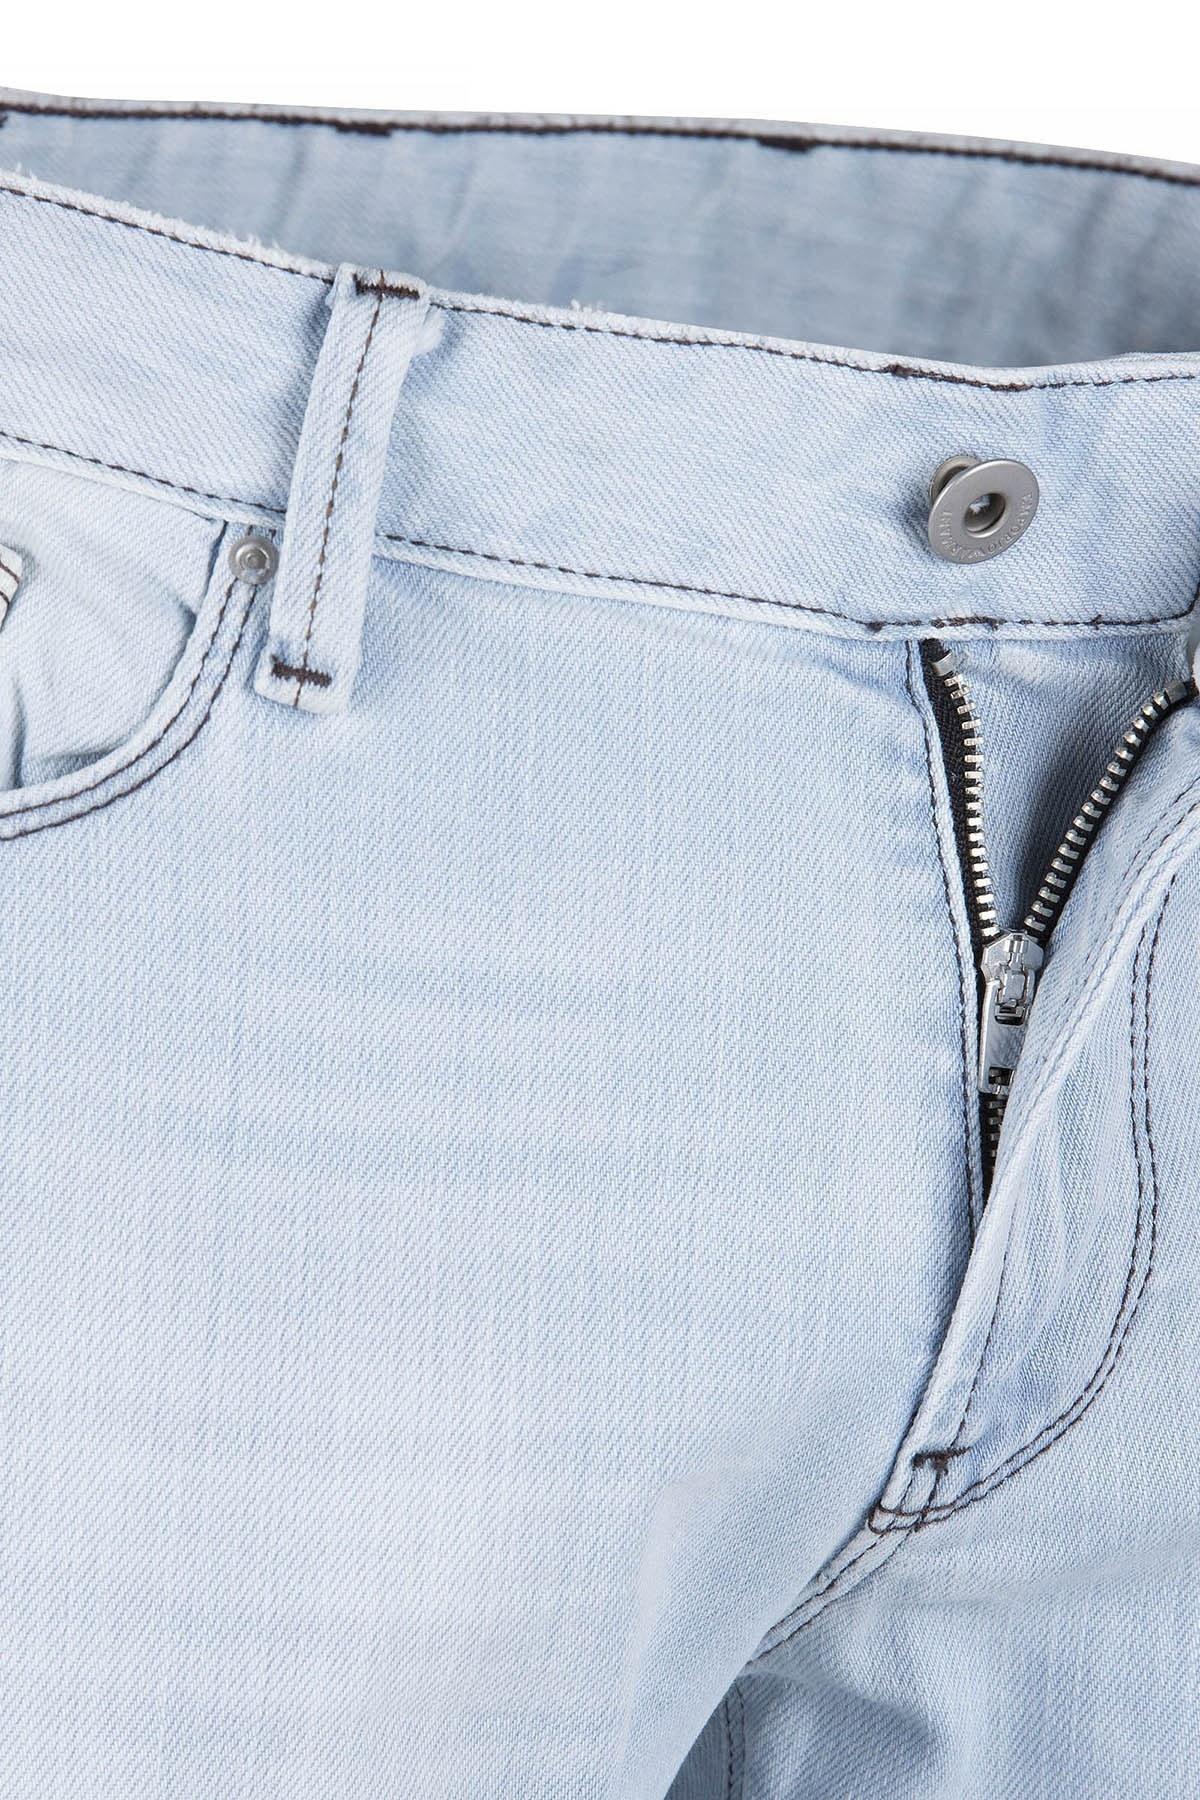 EMPORIO ARMANI J06 JEANS Erkek Kot Pantolon 3Z1J06 1D14Z AÇIK MAVİ